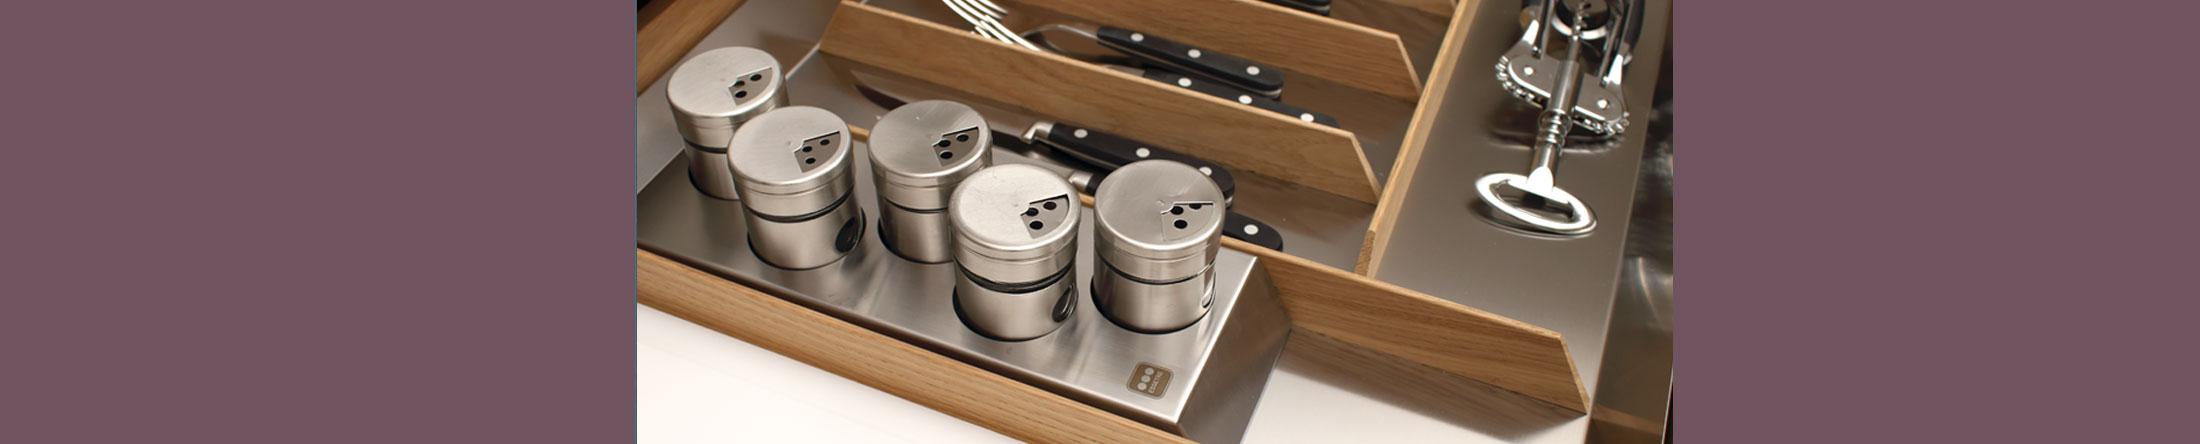 Essetre Spa - Strumenti e Accessori per Cucina - Essetre Spa